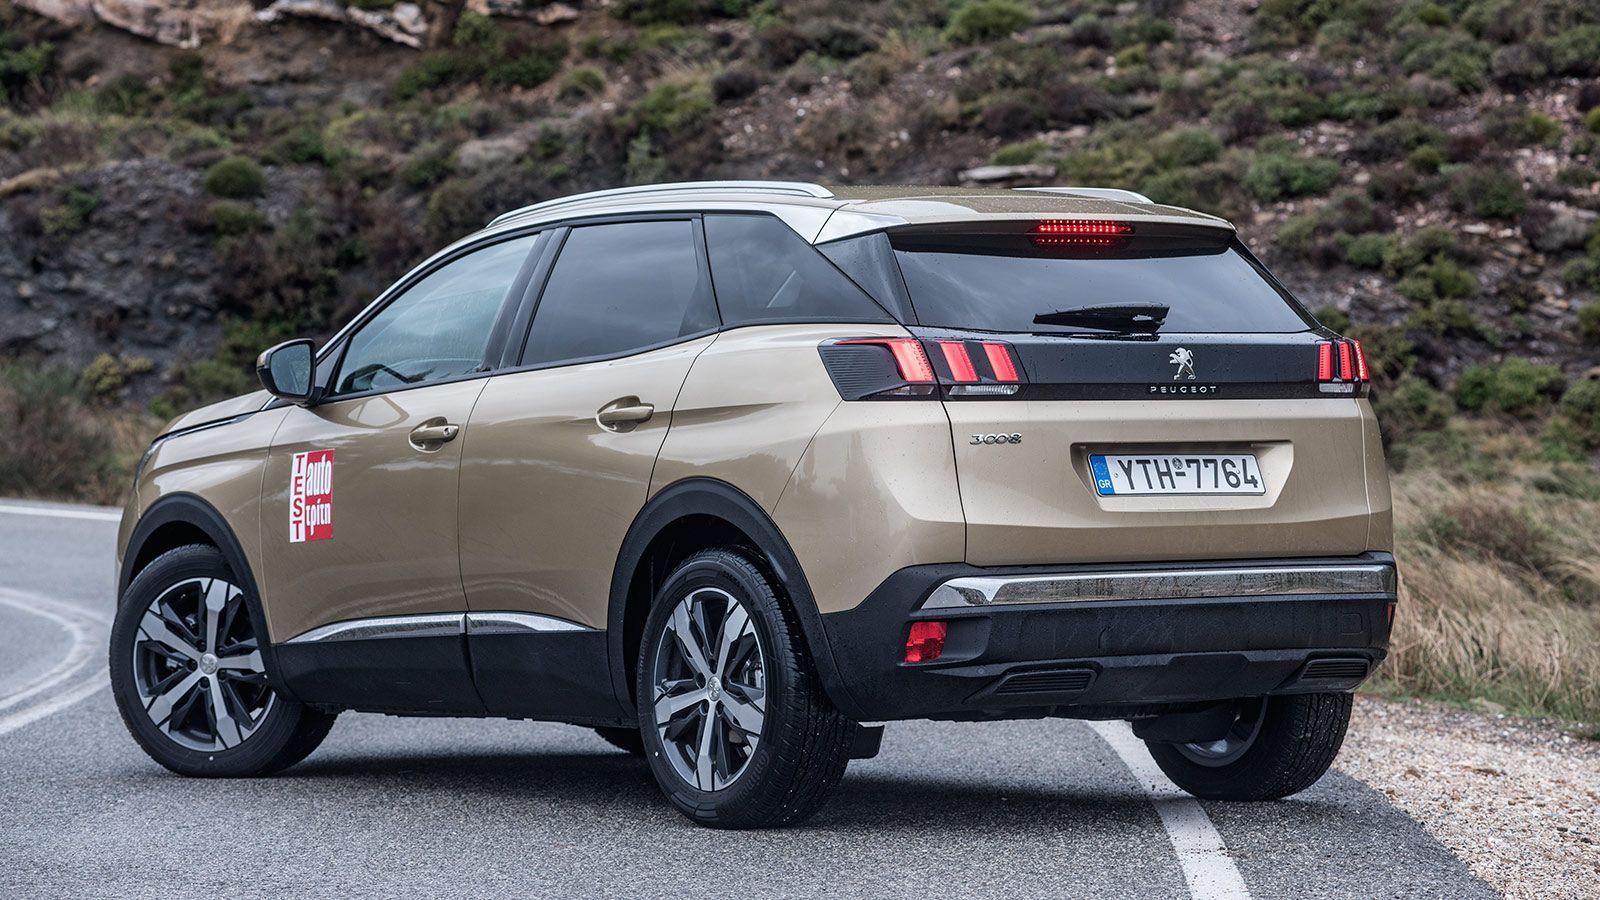 Test: Peugeot 3008 - peugeot 3008